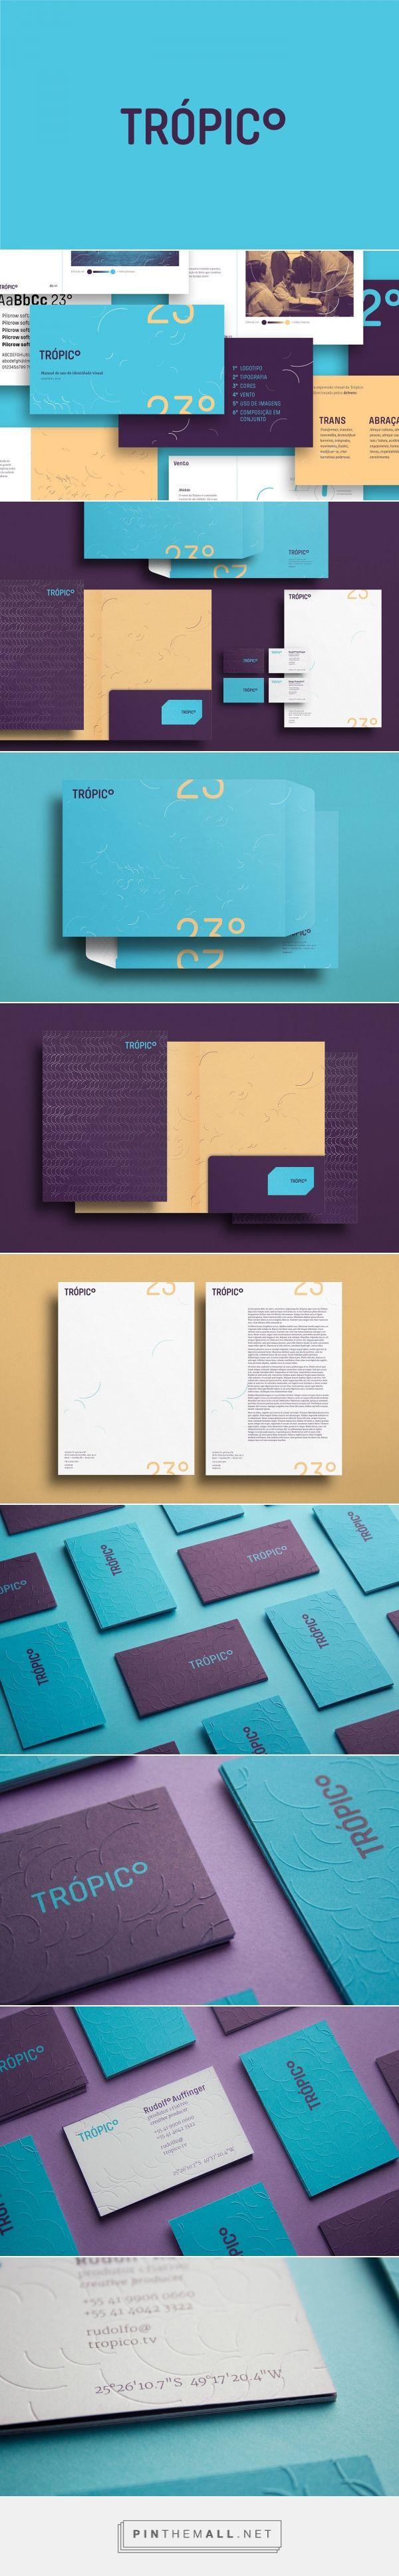 Tropico Production Company Branding by Carlos Bauer | Fivestar Branding Agency – Design and Branding Agency & Inspiration Gallery